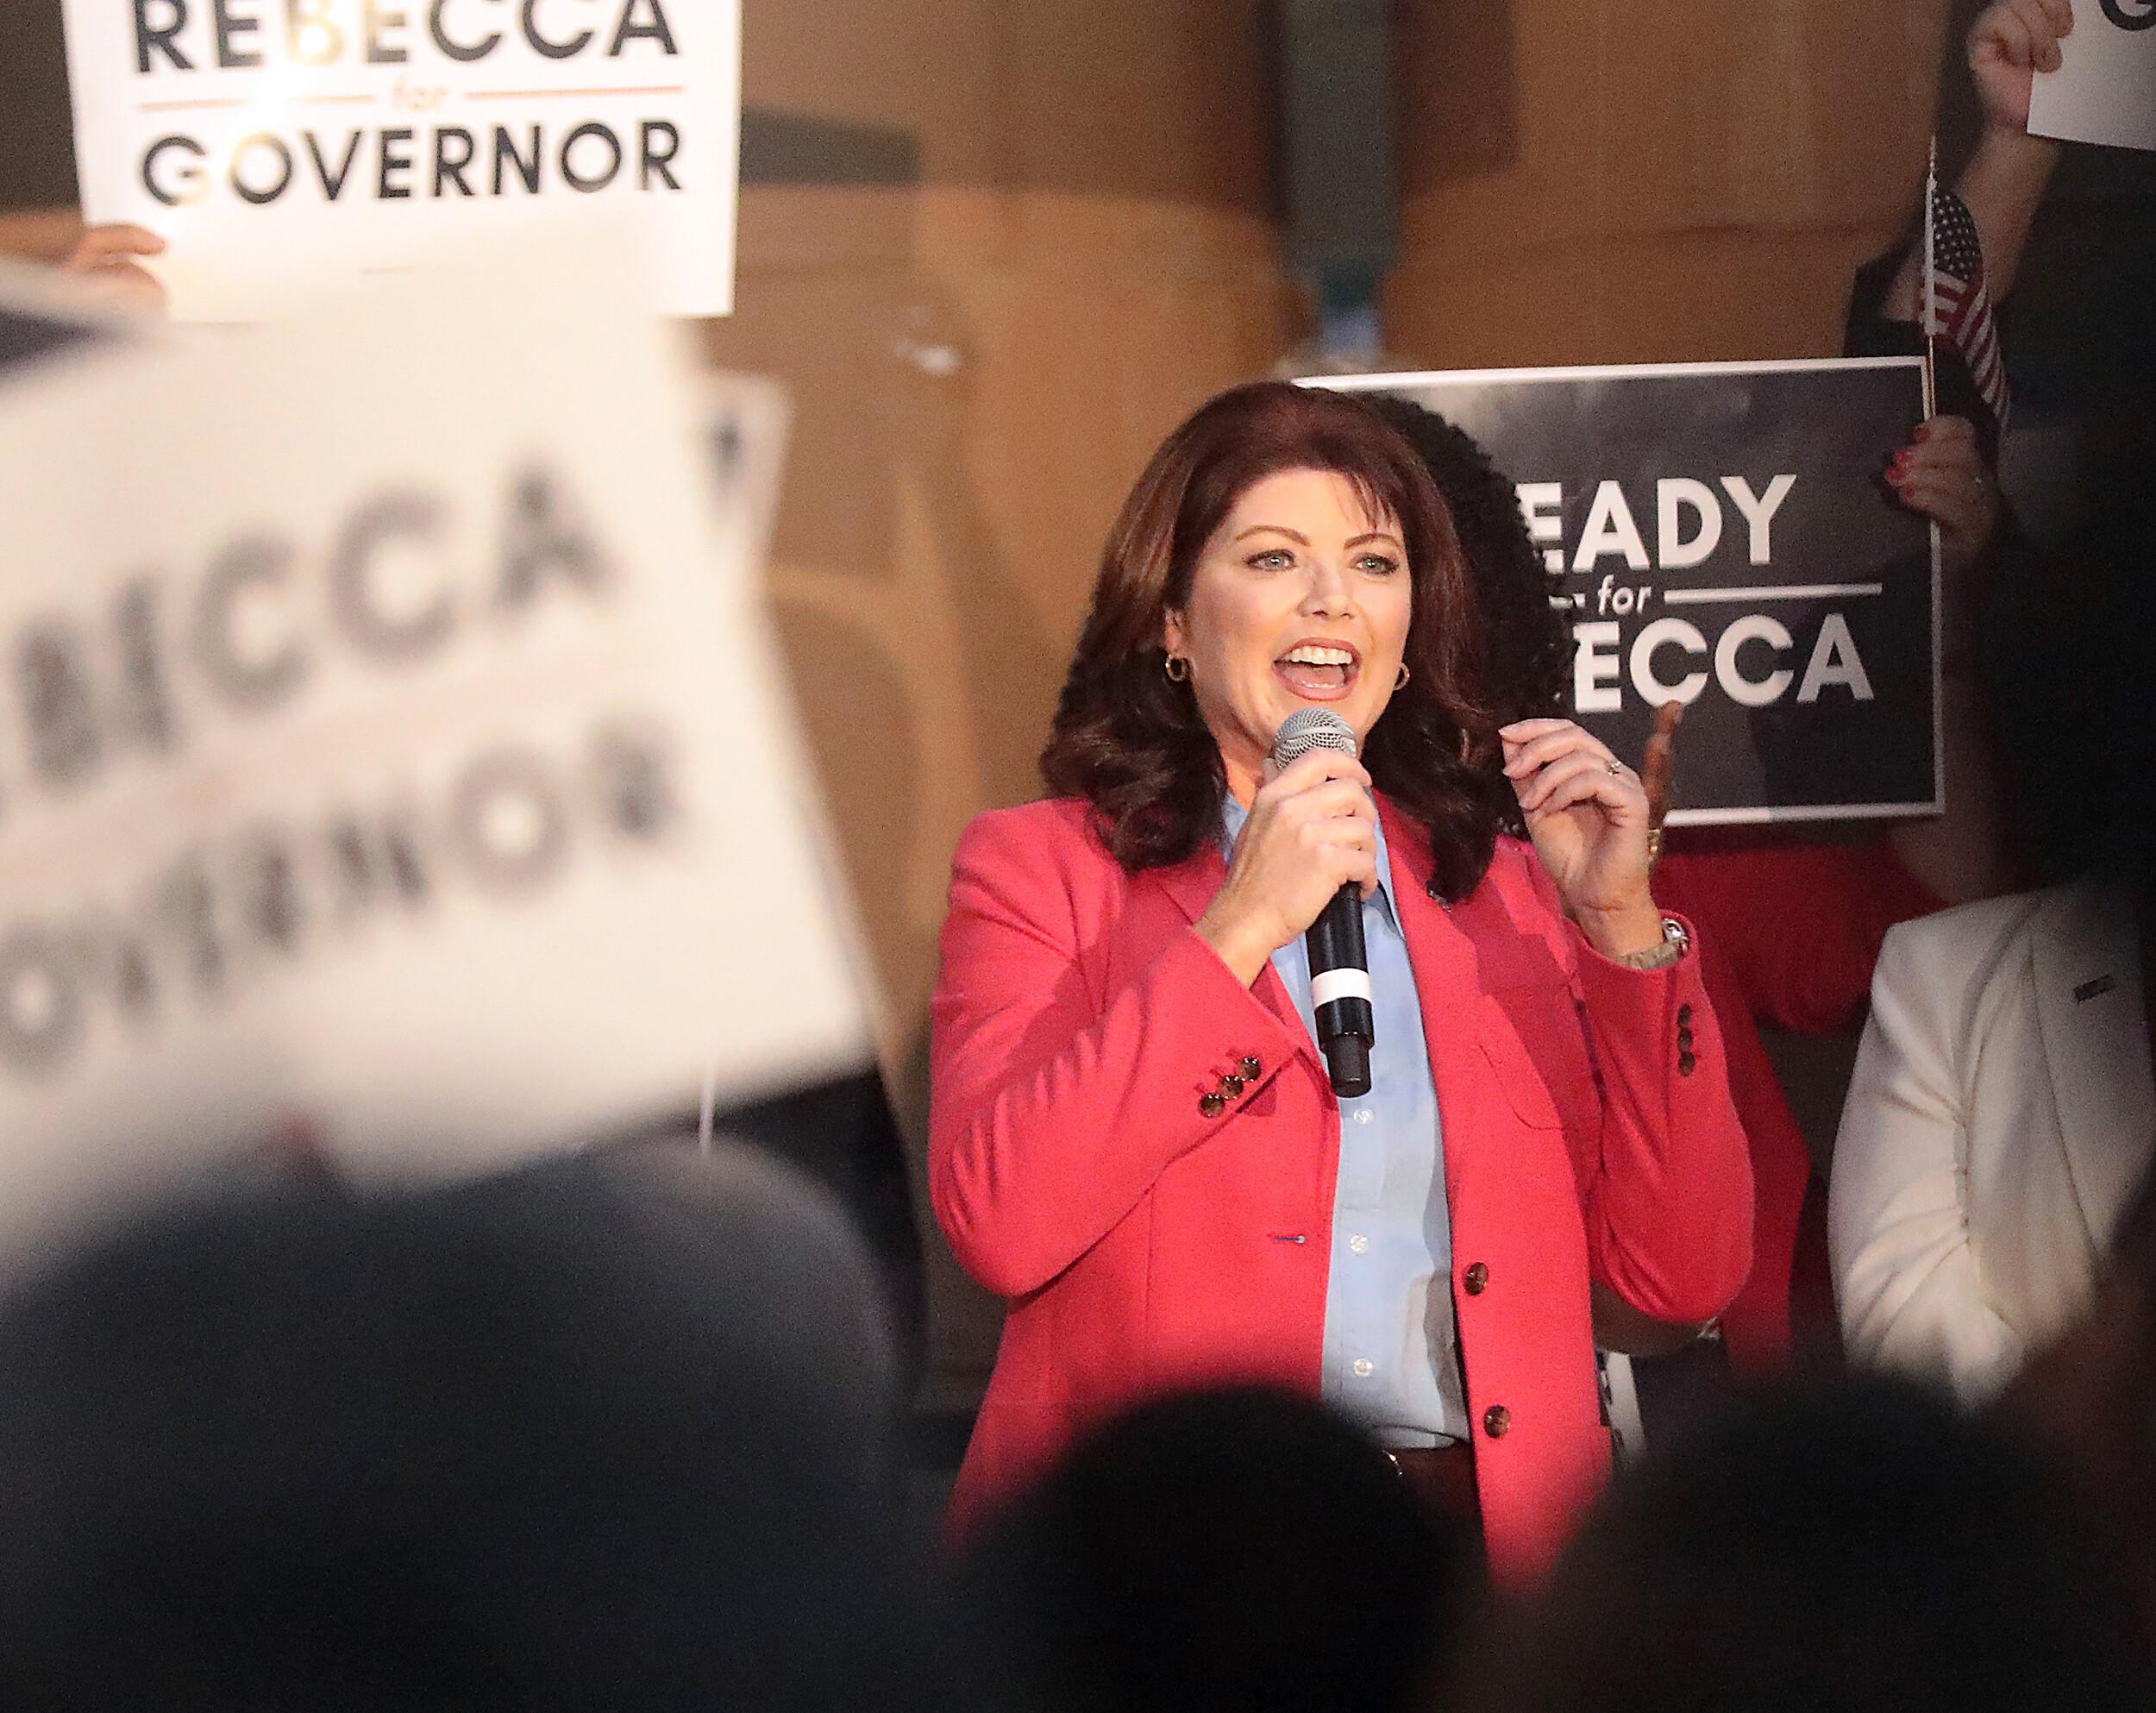 Former Wisconsin Lt. Gov. Rebecca Kleefisch announces GOP gubernatorial bid